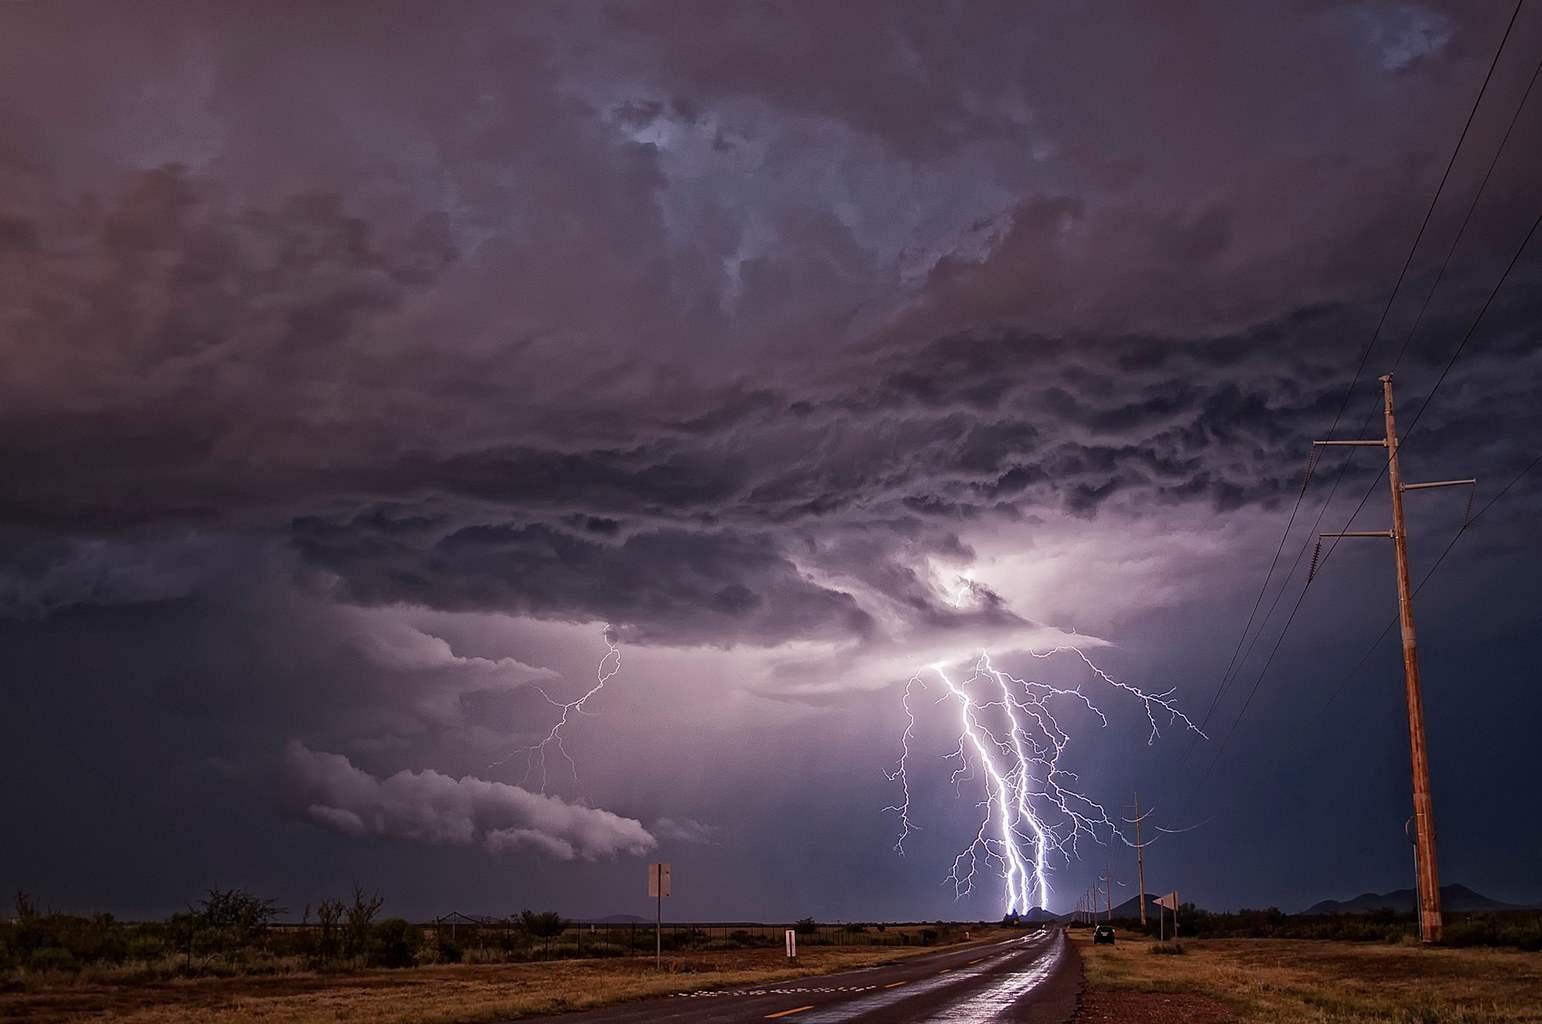 A monsoon thunderstorm just north of Sierra Vista, AZ. Sept, 2011.